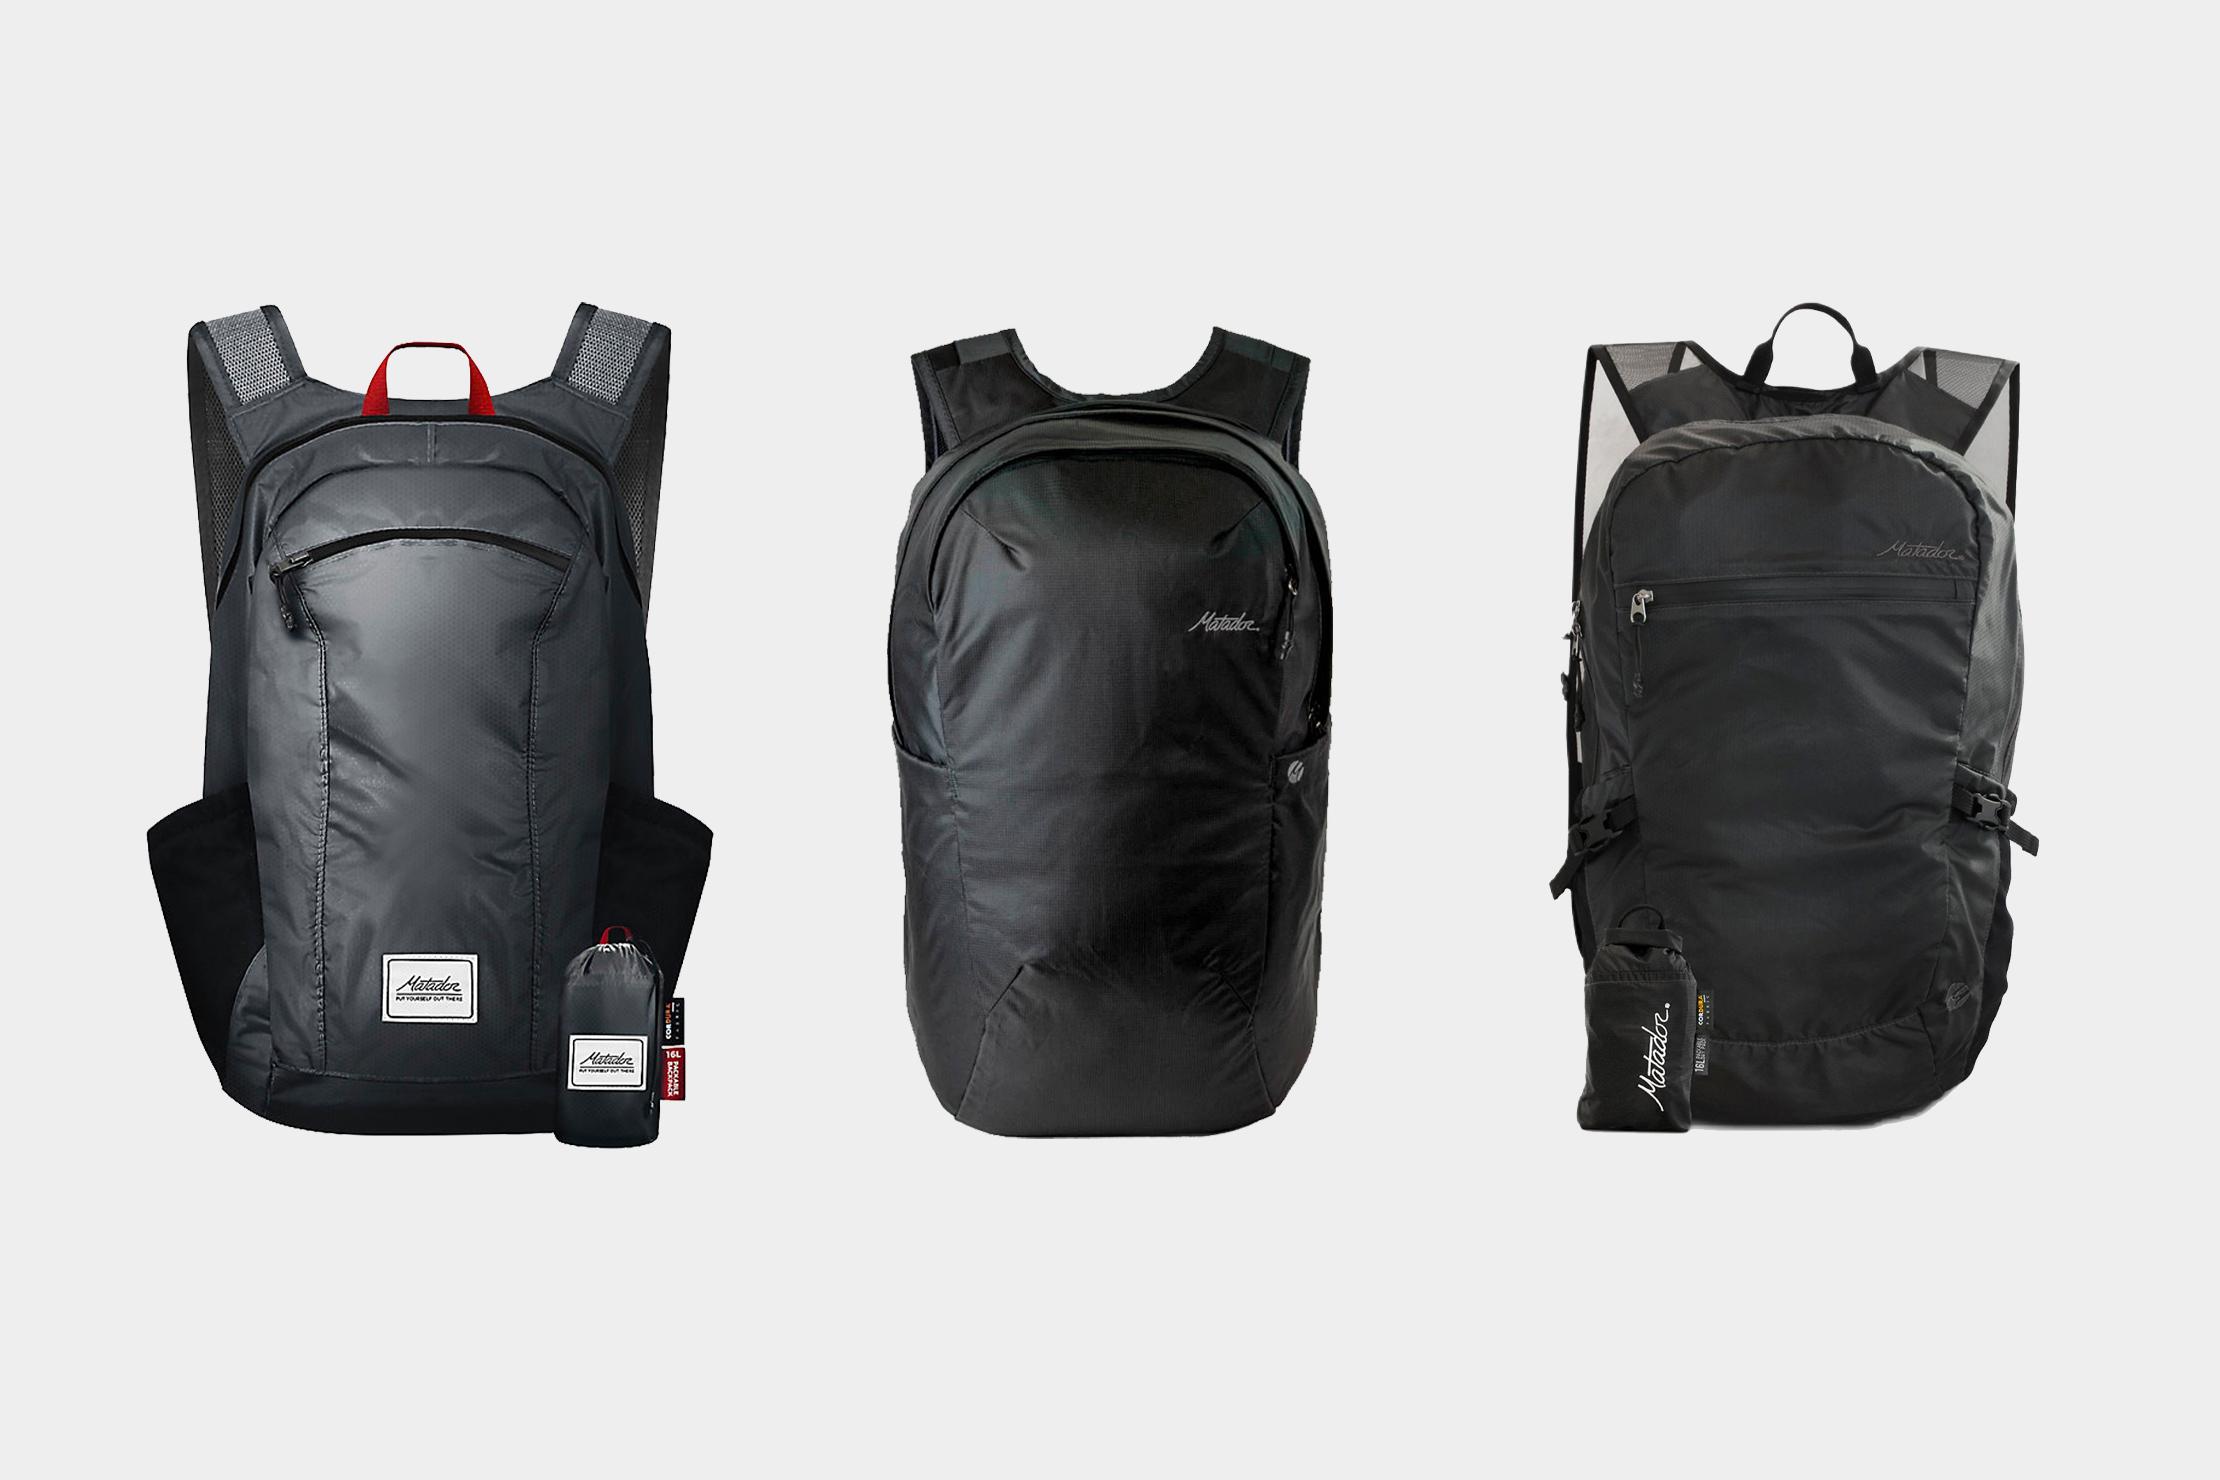 Matador On-Grid Packable Backpack Comparison